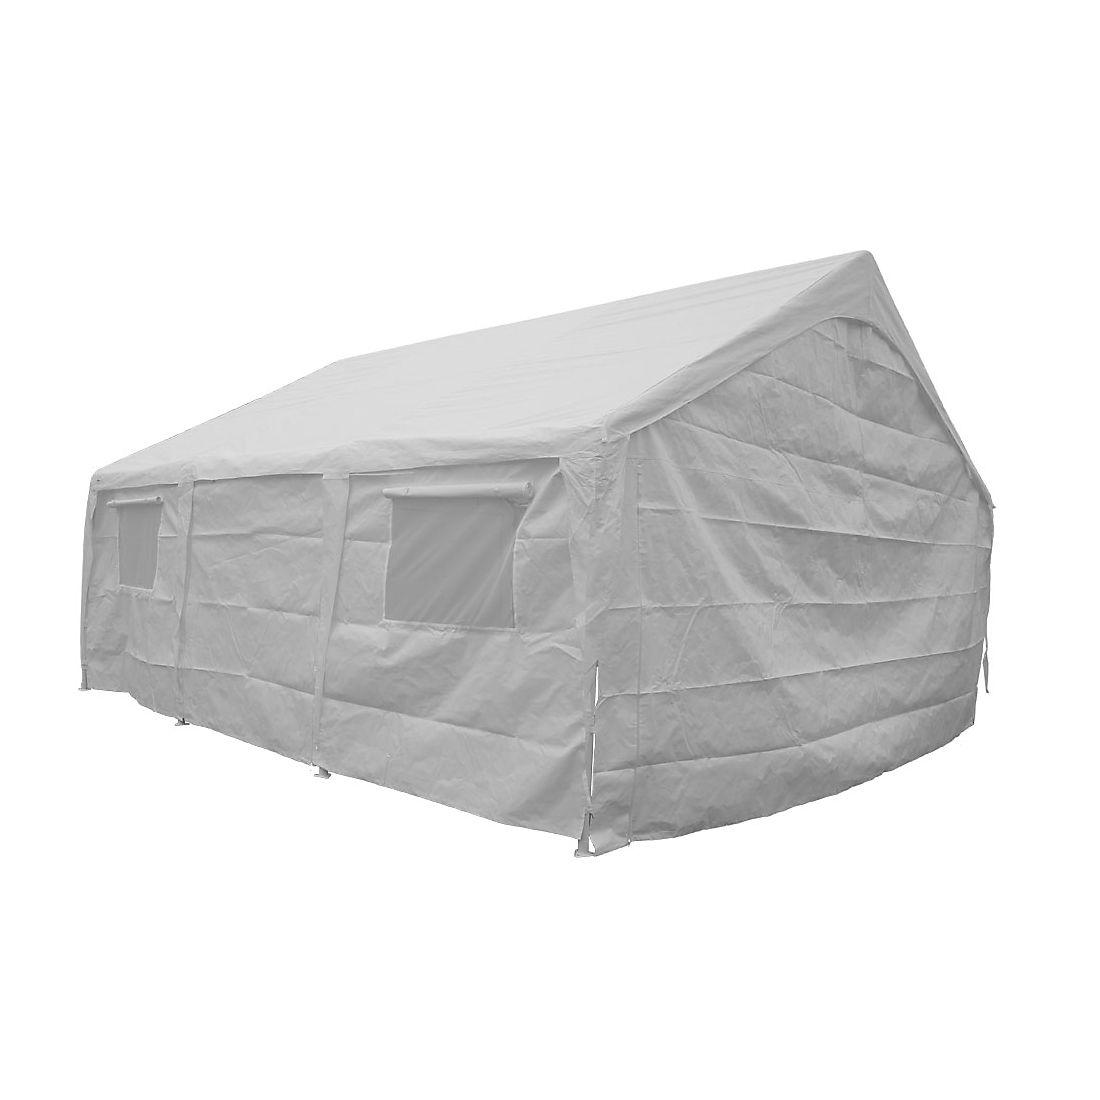 Impact Canopy 20' Party Tent Enclosure Kit